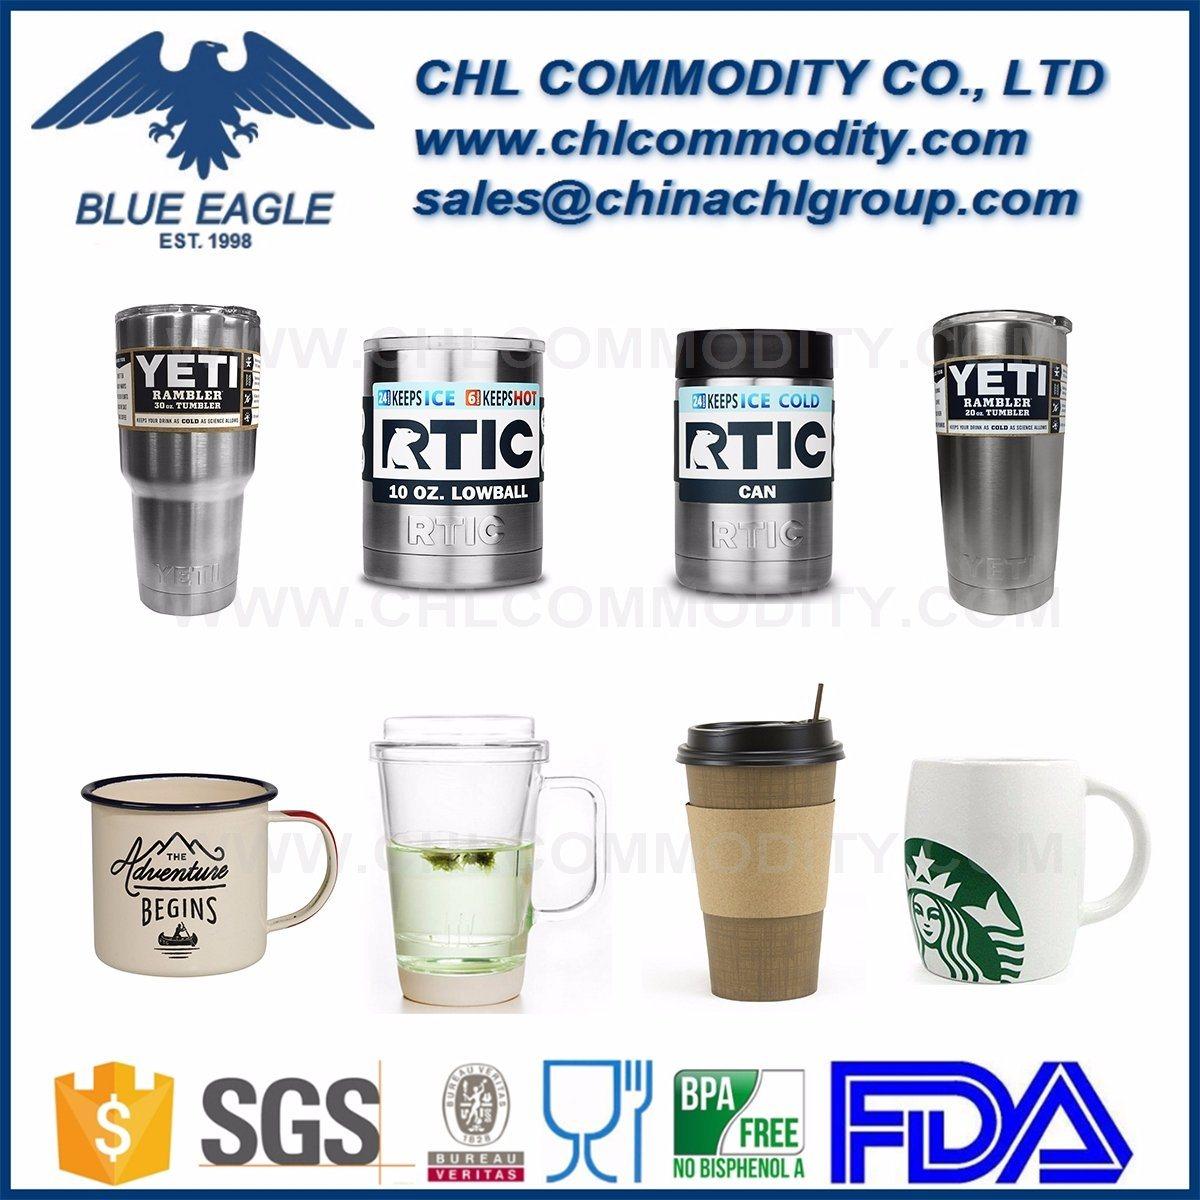 Double Wall Insulated Vacuum Stainless Steel Beer Mug, Enamel Camping Mug, Ceramic Coffee Mug, Glass Travel Mug, Customized Paper Mug